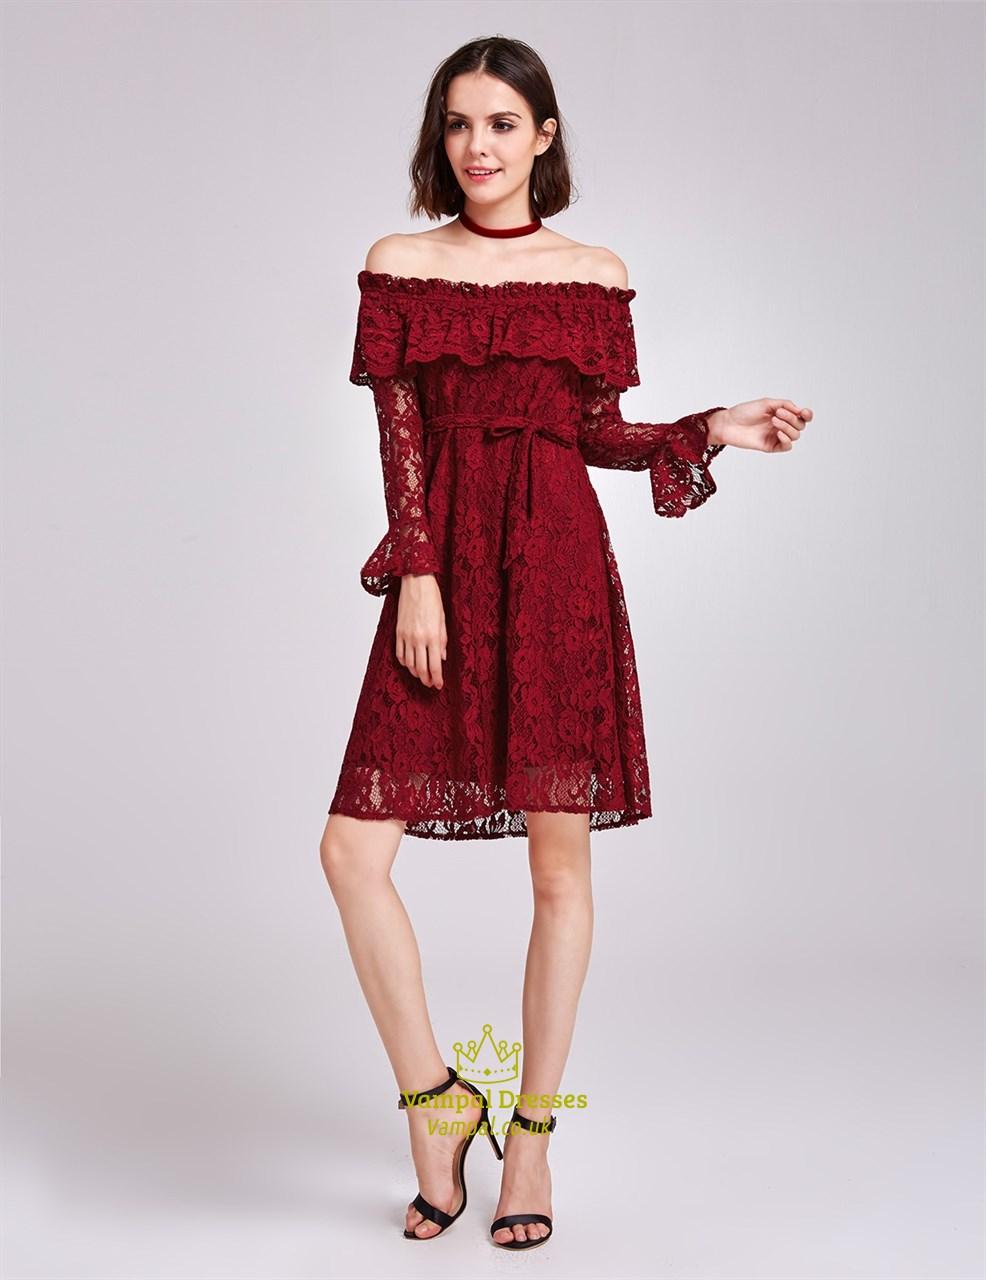 454704dc467d Burgundy Off The Shoulder Long Sleeve A-Line Short Lace Cocktail Dress